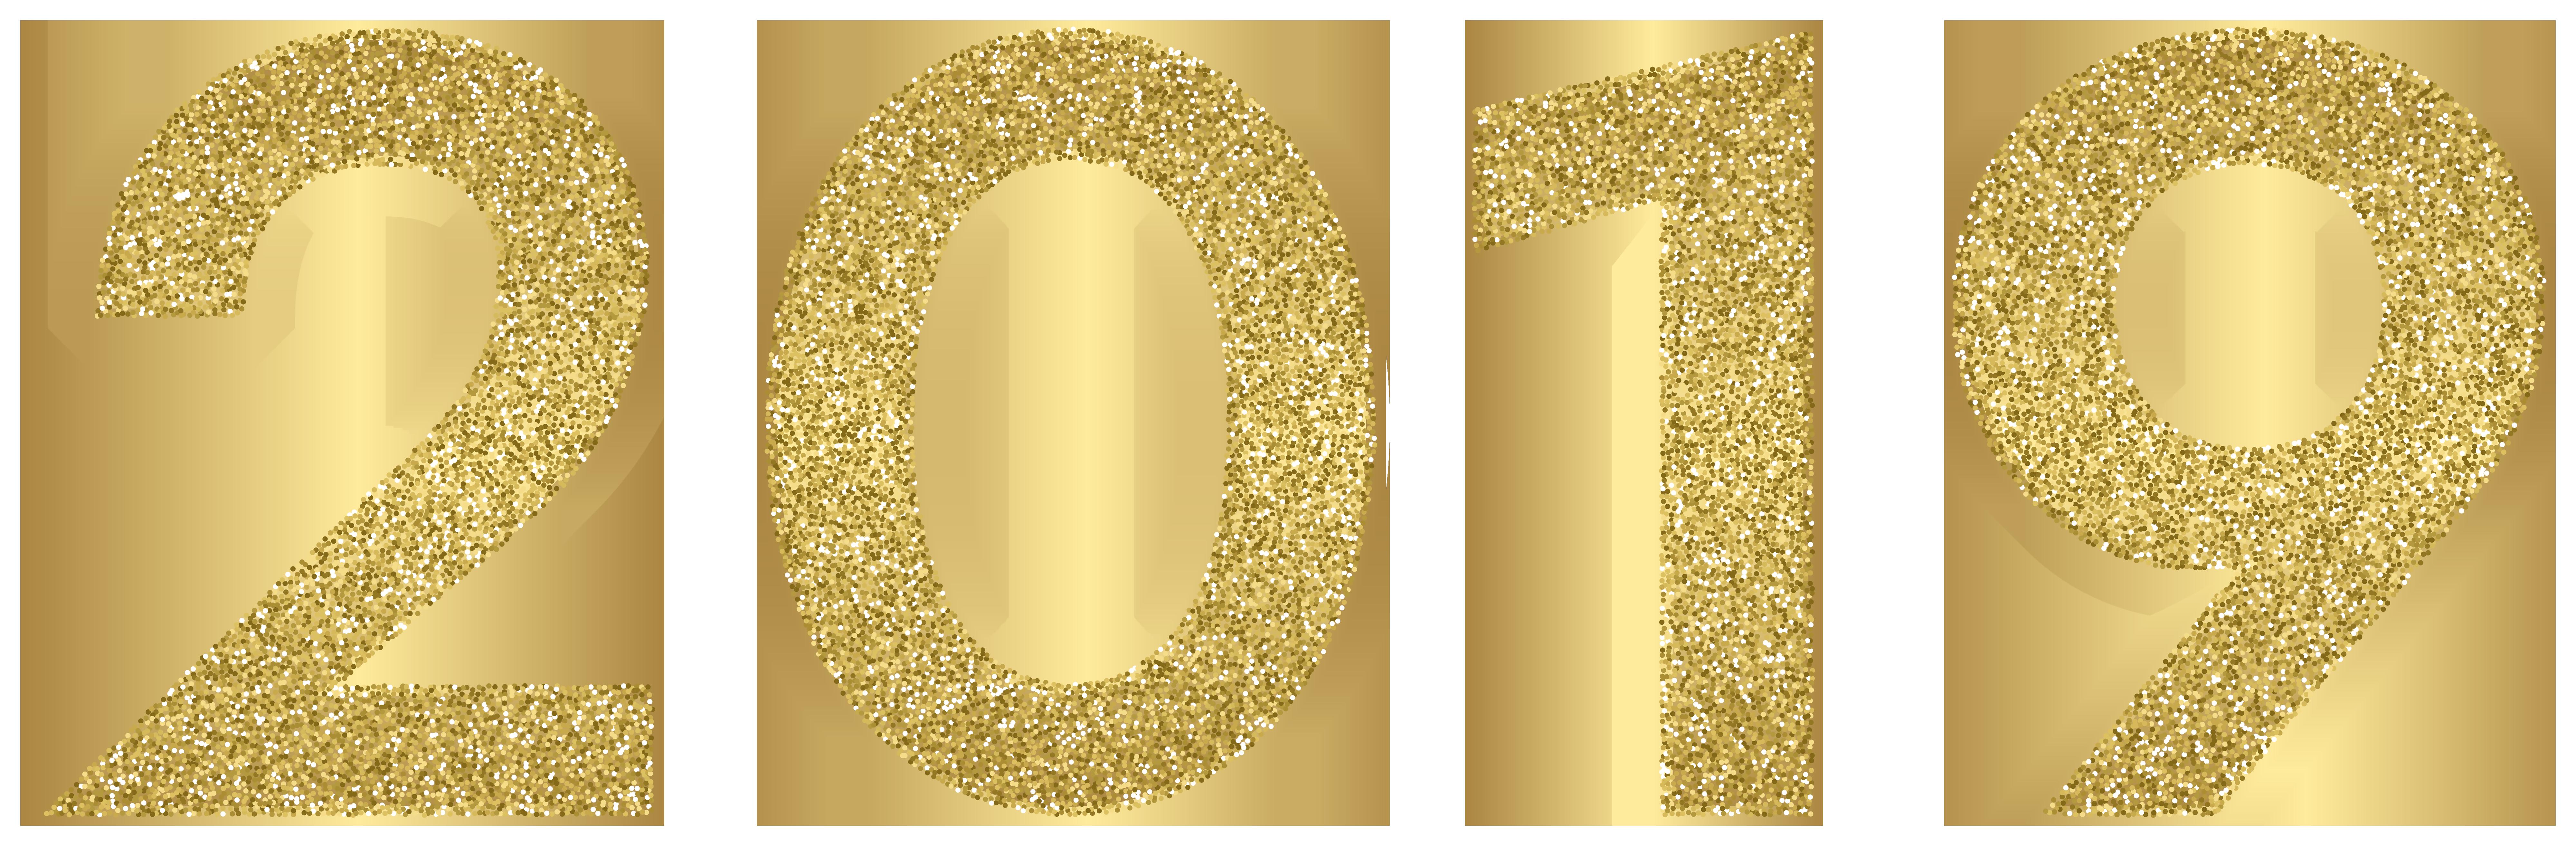 2019 Gold Large Clip Art Image.